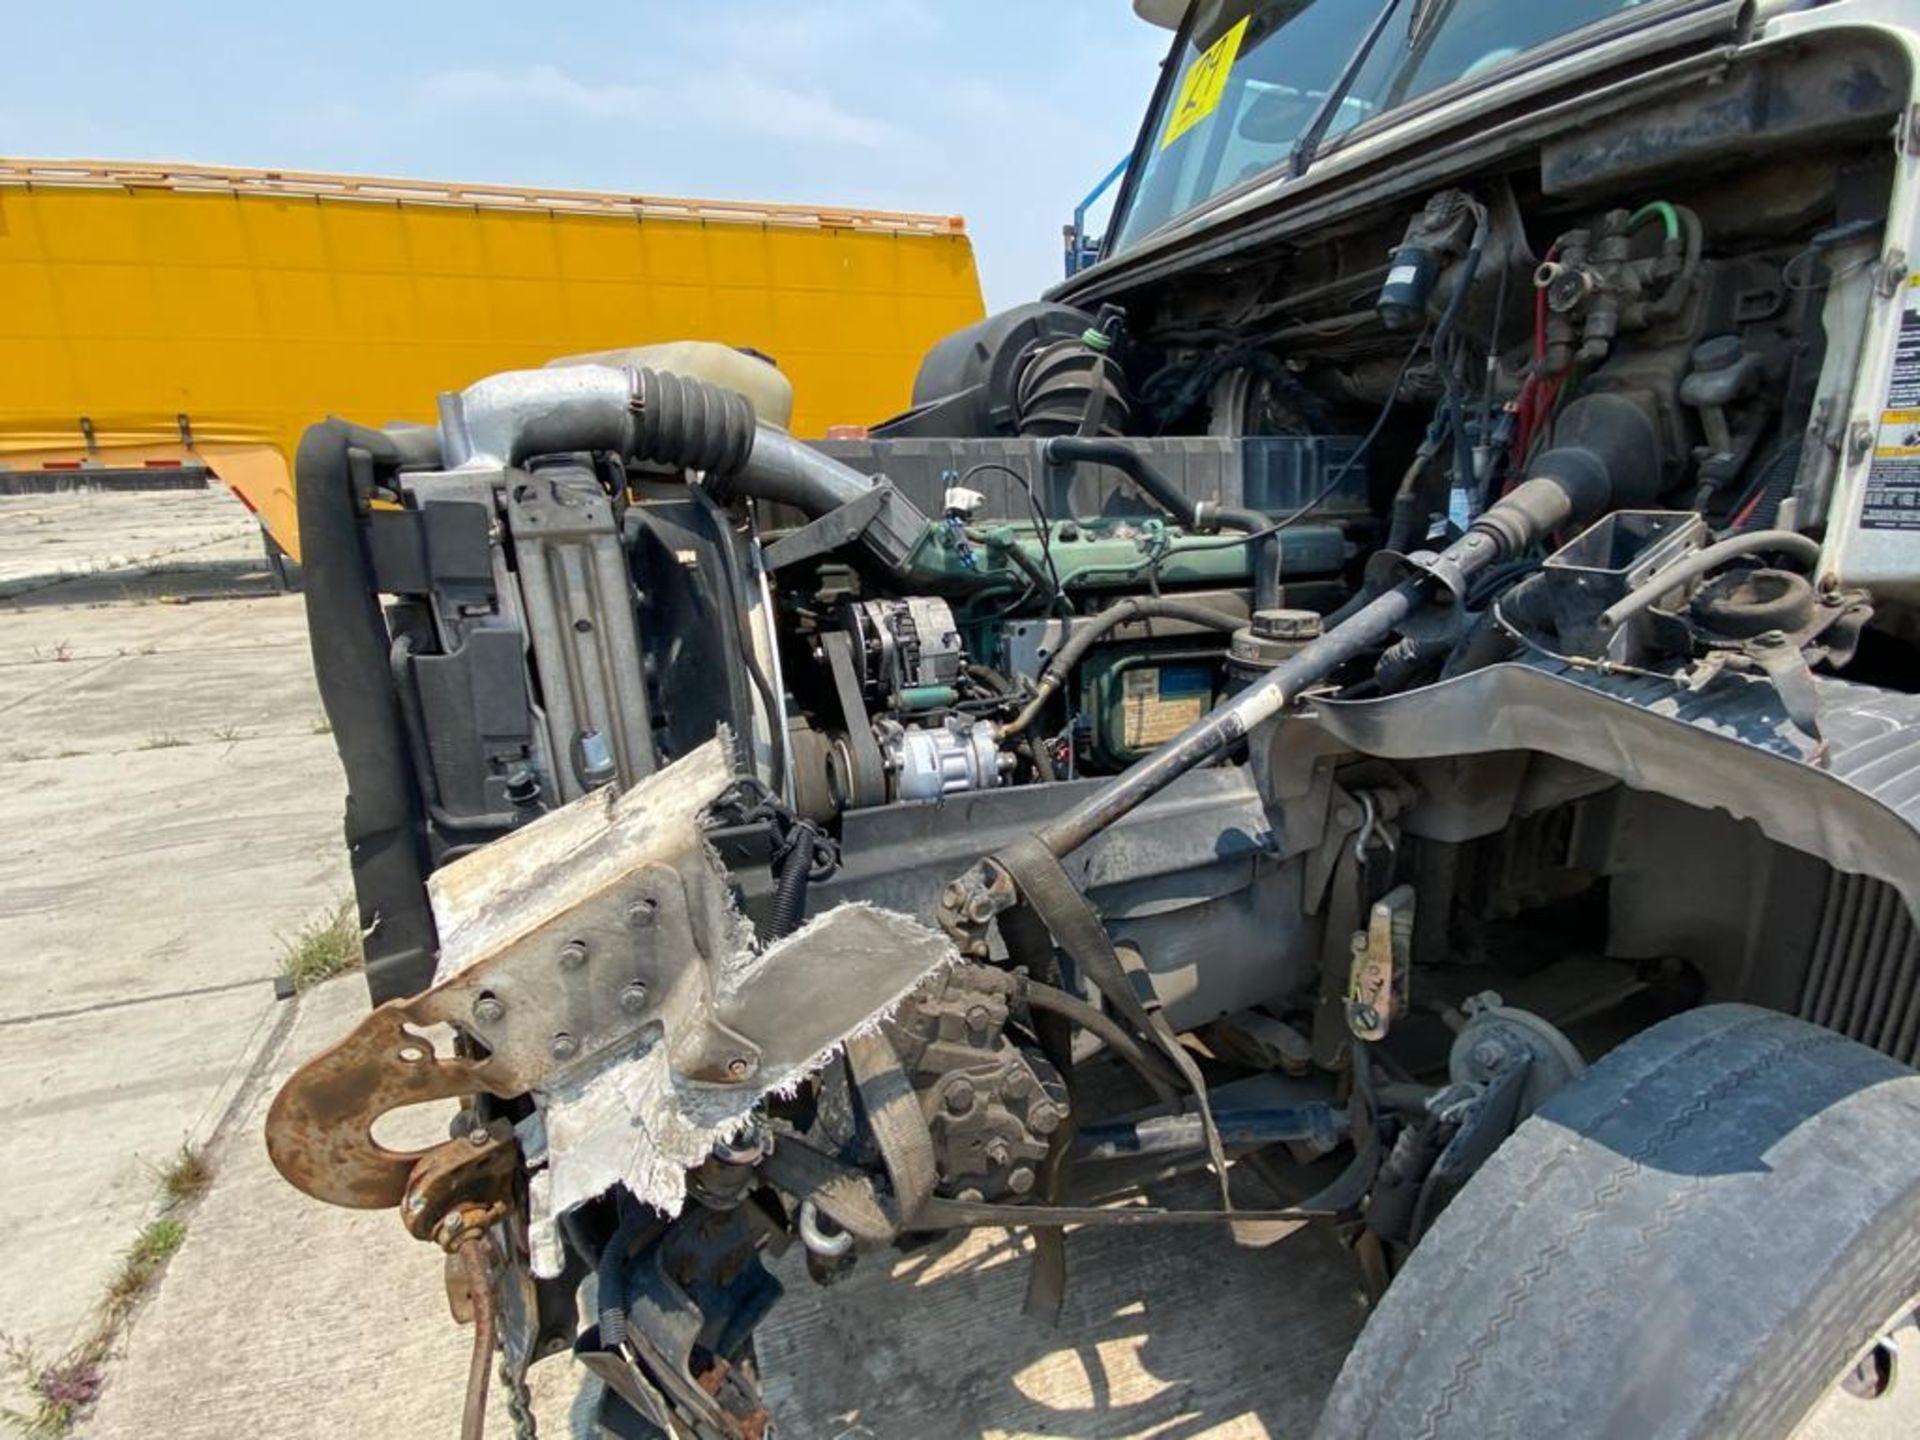 2001 Volvo Sleeper Truck Tractor, estándar transmissión of 18 speeds, with Volvo motor - Image 34 of 60